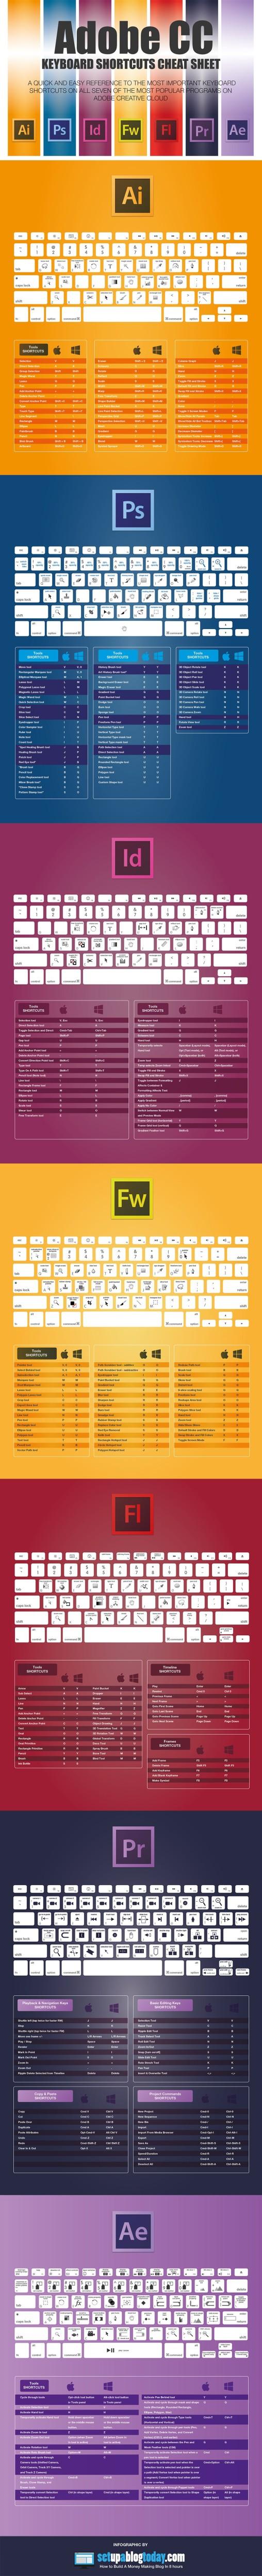 Tahák na Adobe: 7 TOP produktů – Infografika